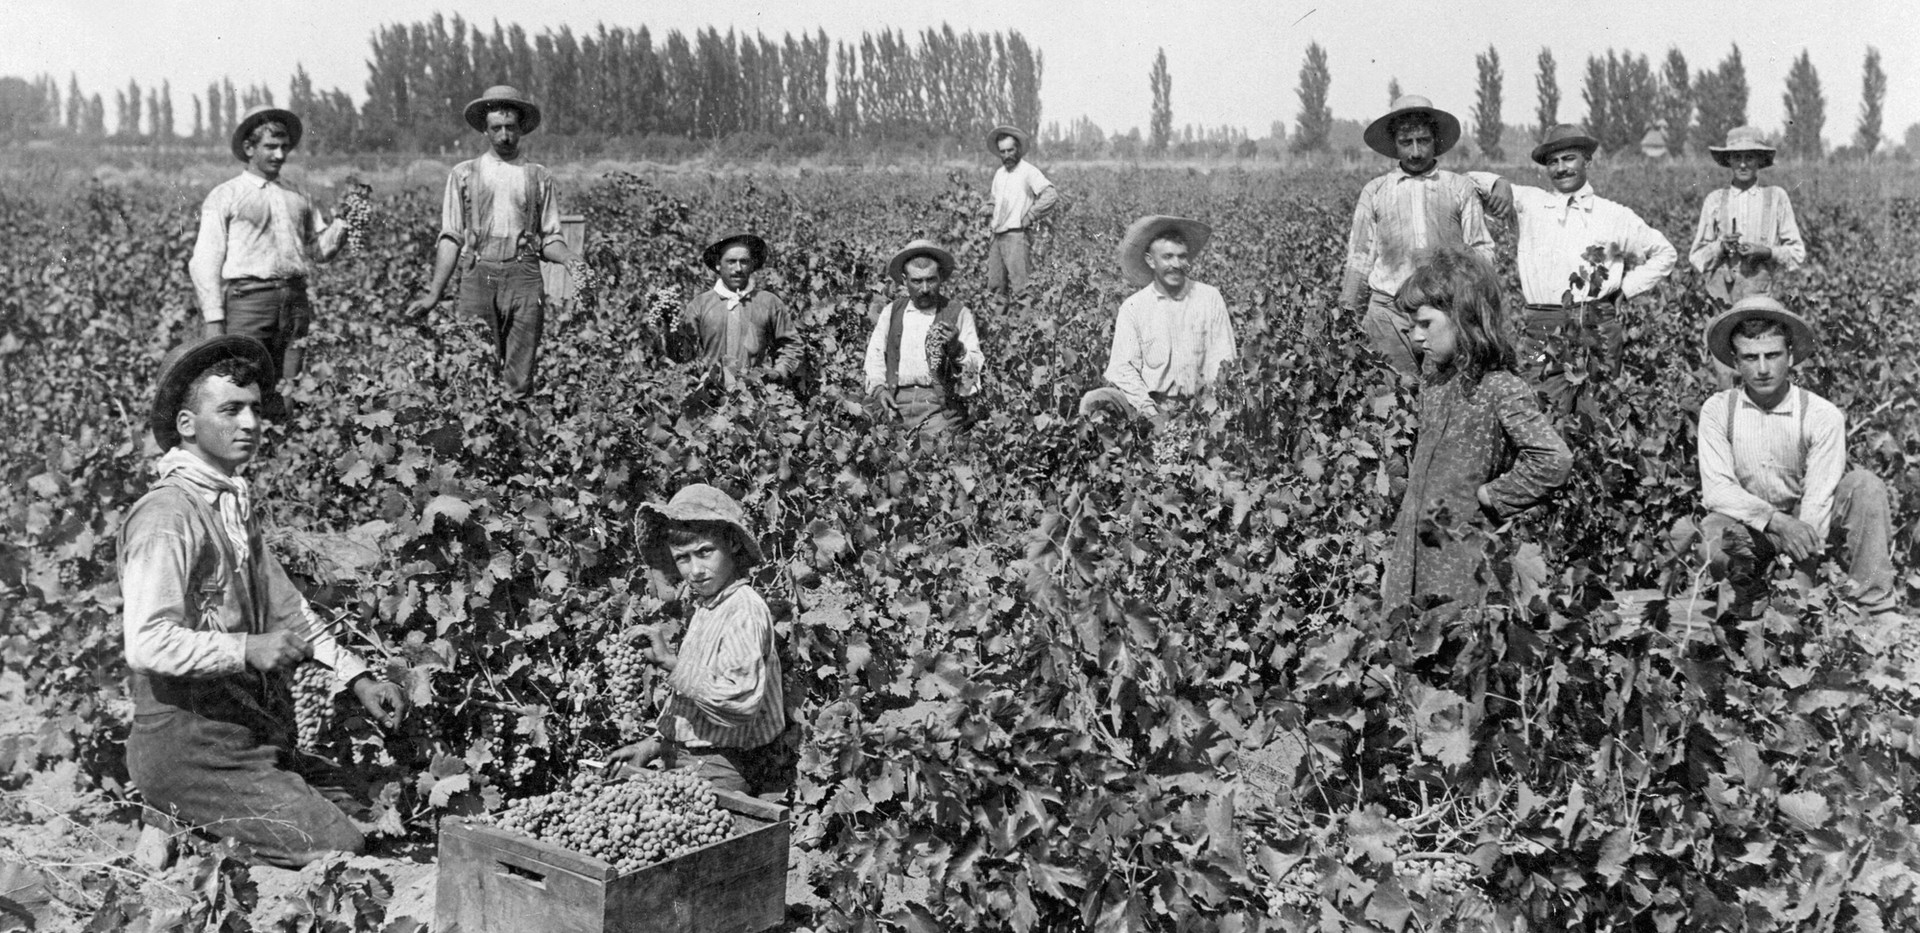 Armenians picking grapes at Kearney Vineyard.